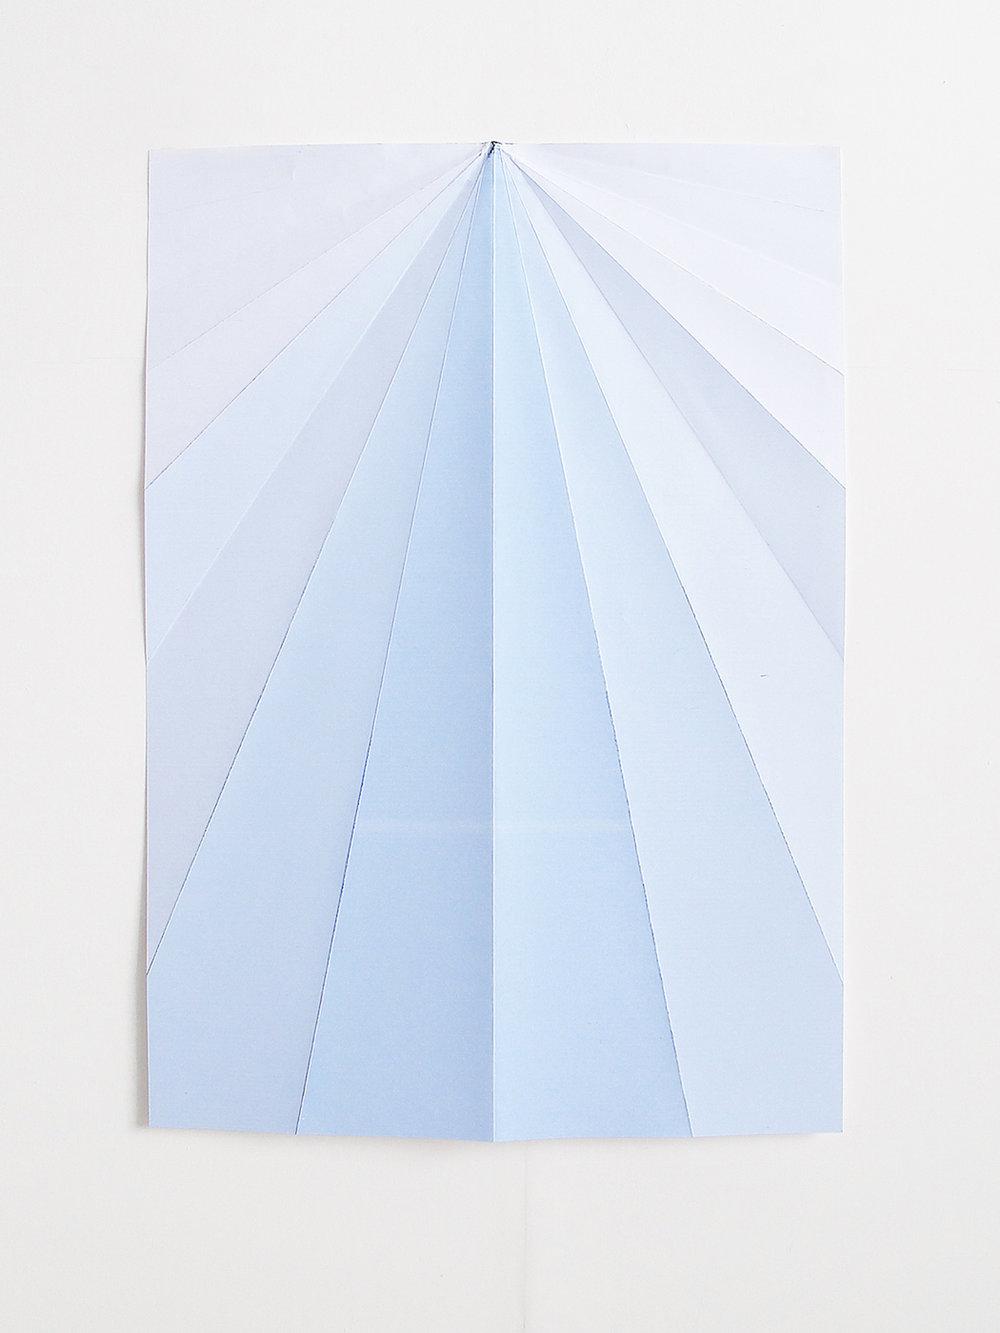 Caline Aoun  Blue paper plane 2015 Inkjet print on folded paper  146 x 105 cm